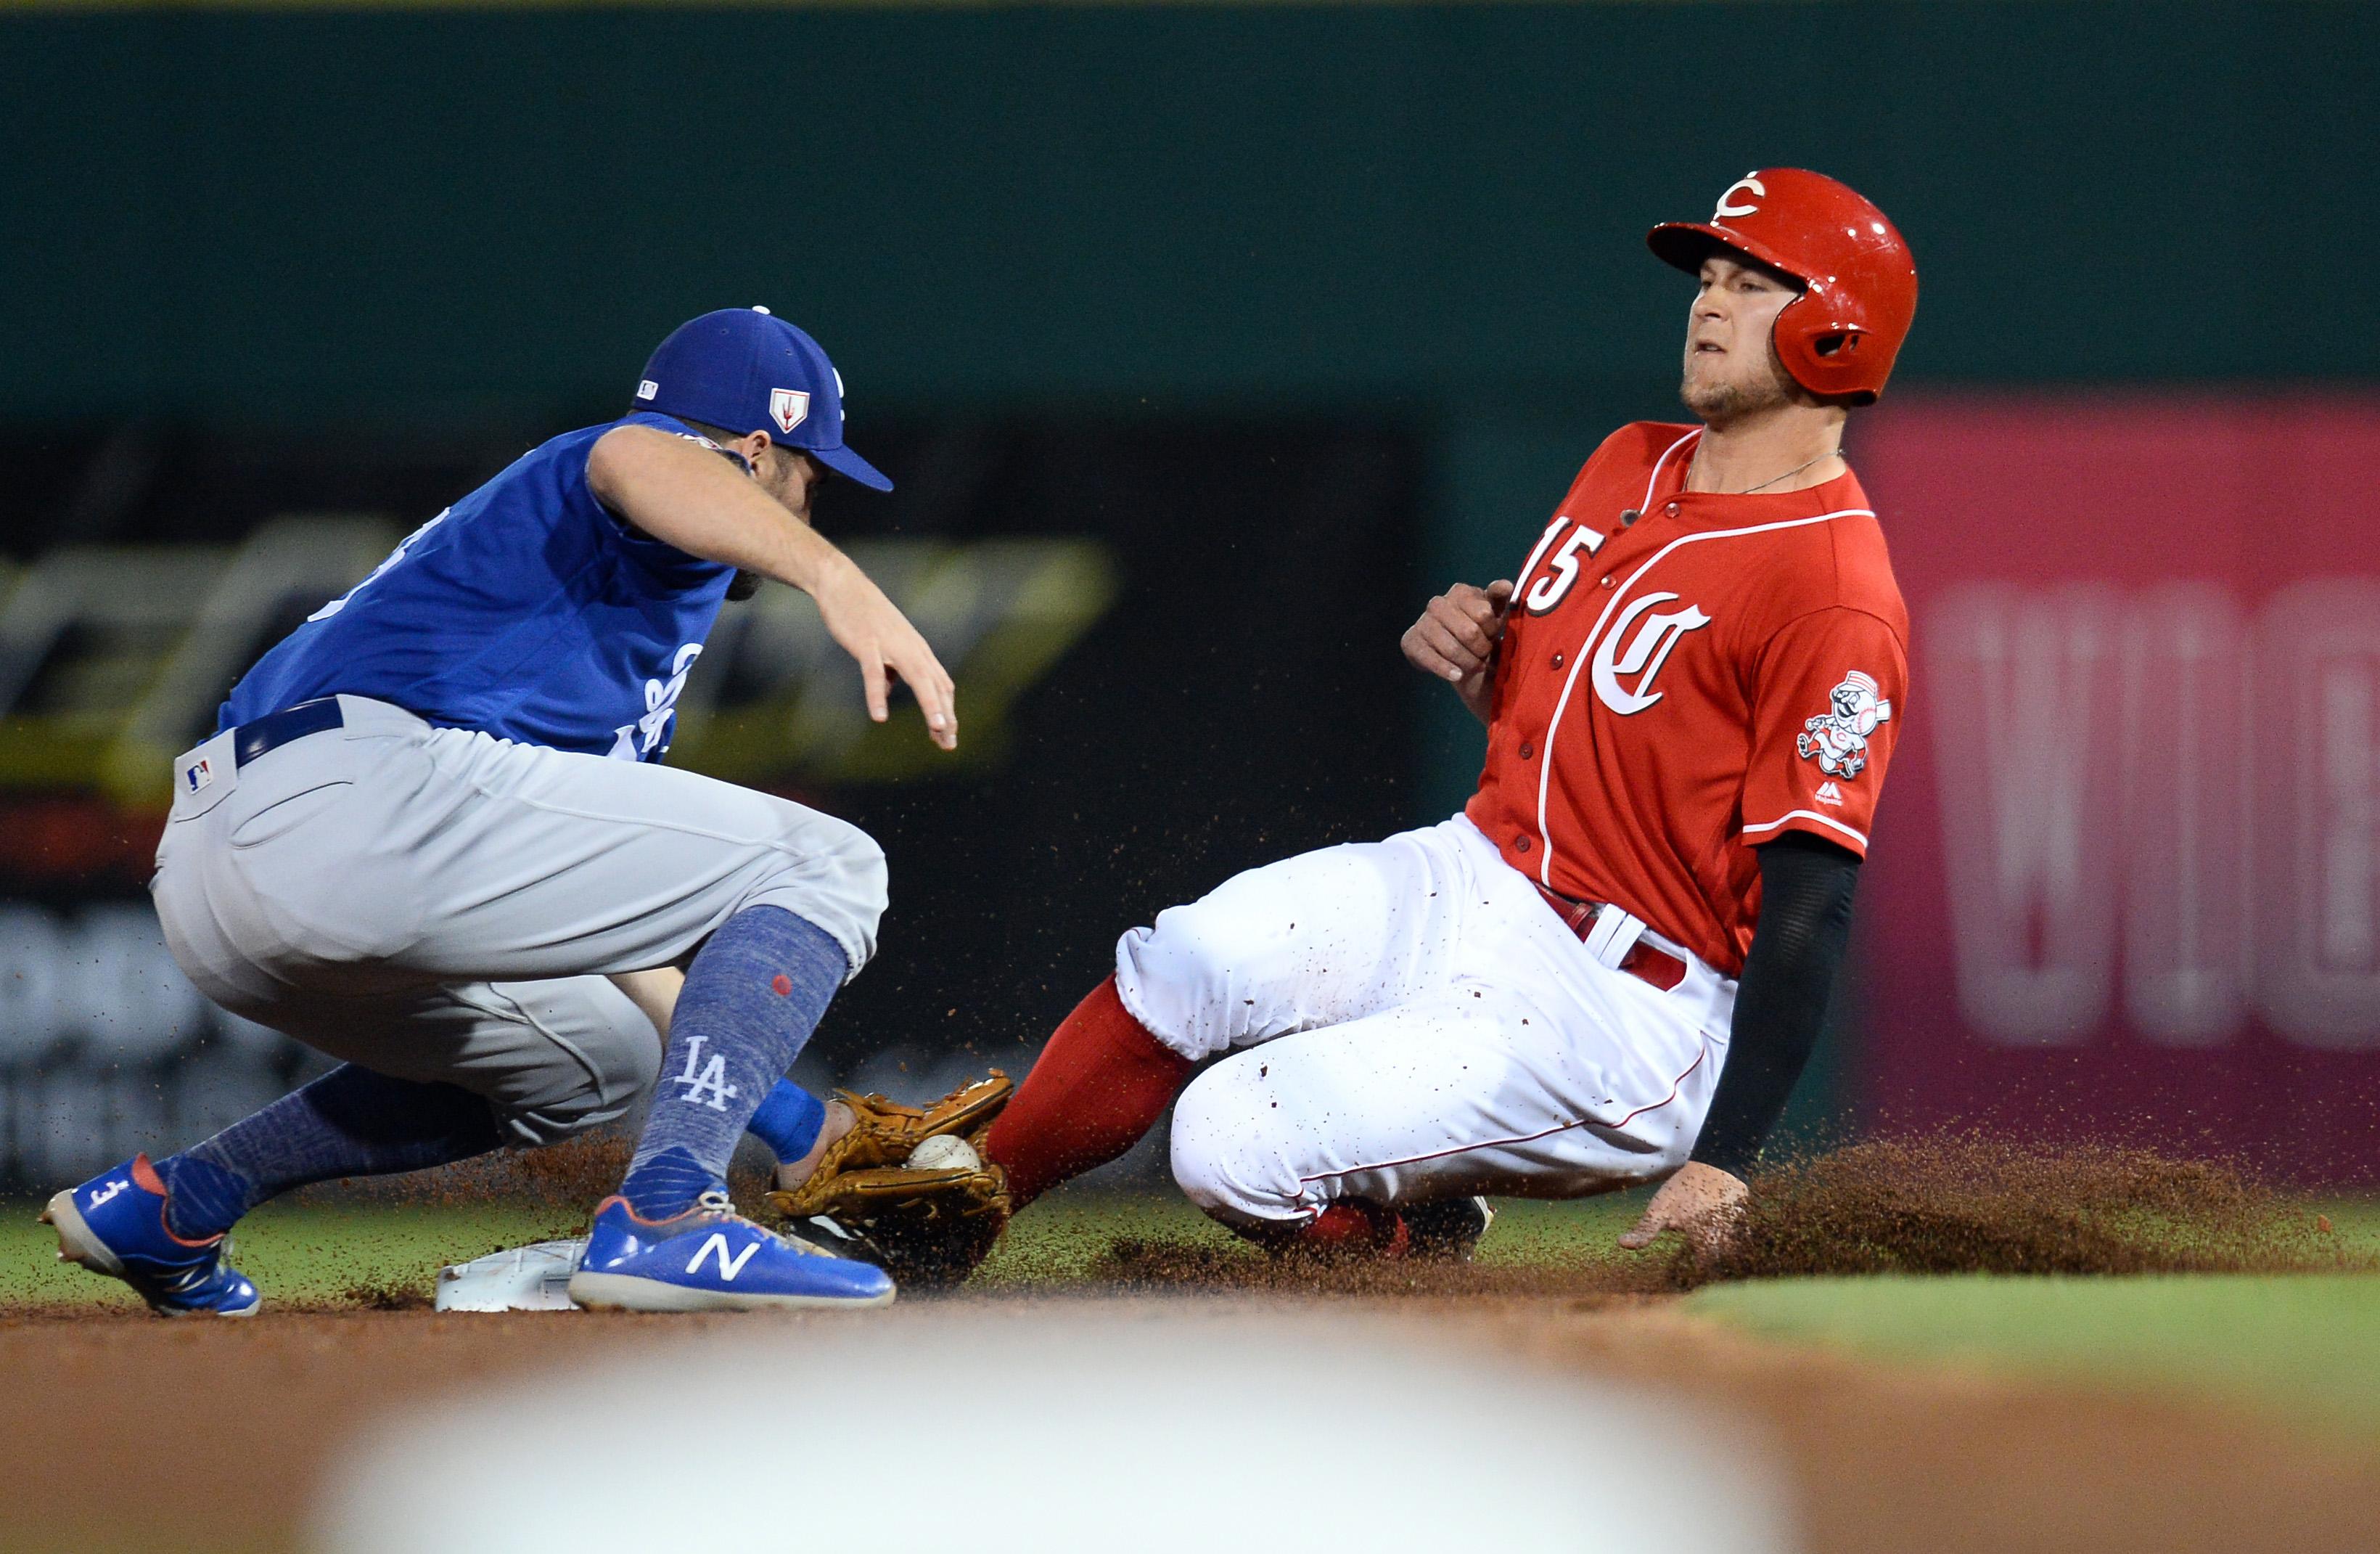 MLB: Spring Training-Los Angeles Dodgers at Cincinnati Reds